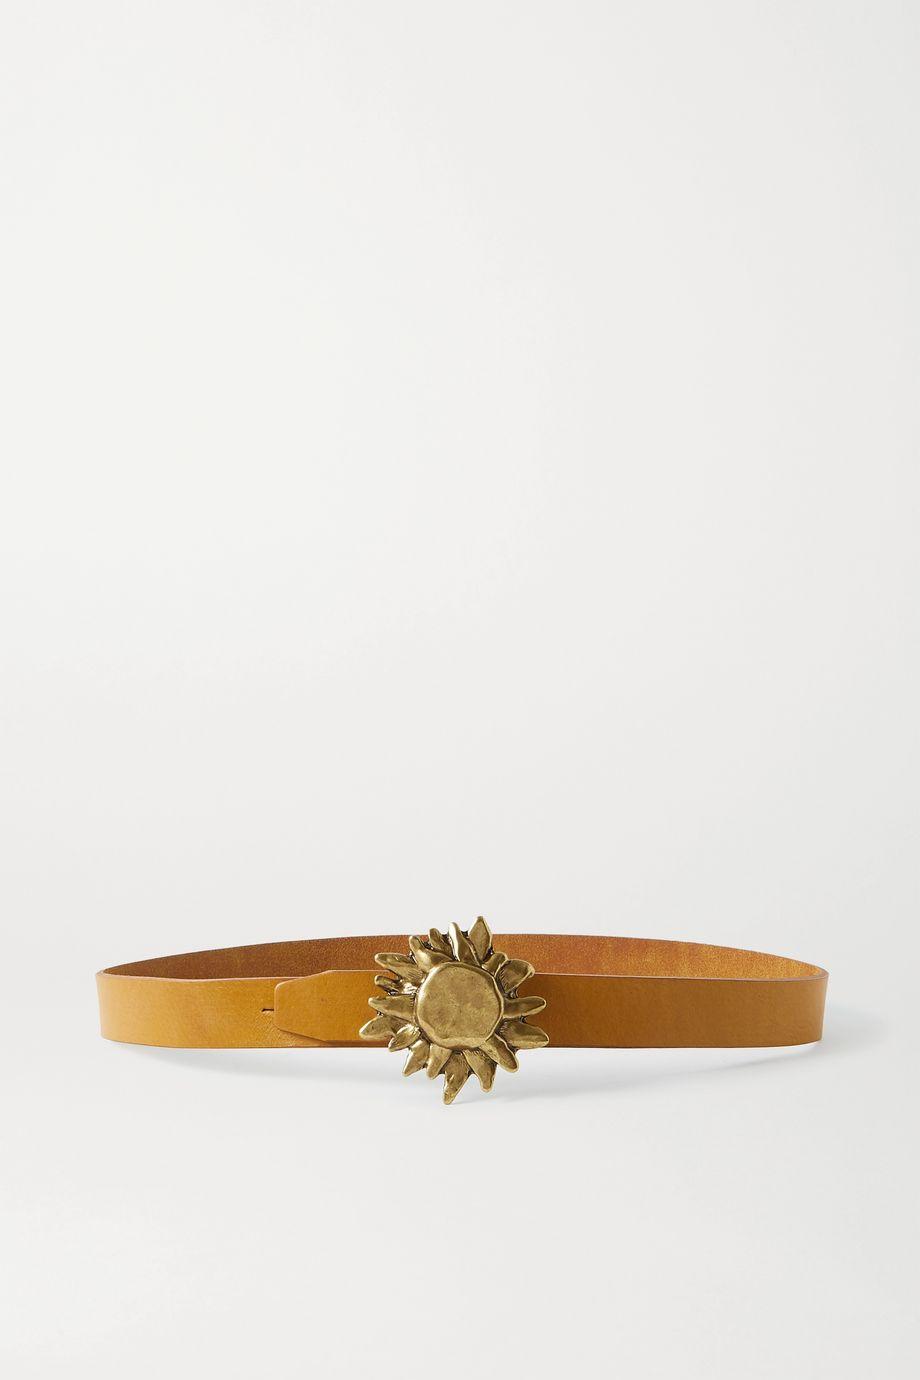 Àcheval Pampa Sun leather belt